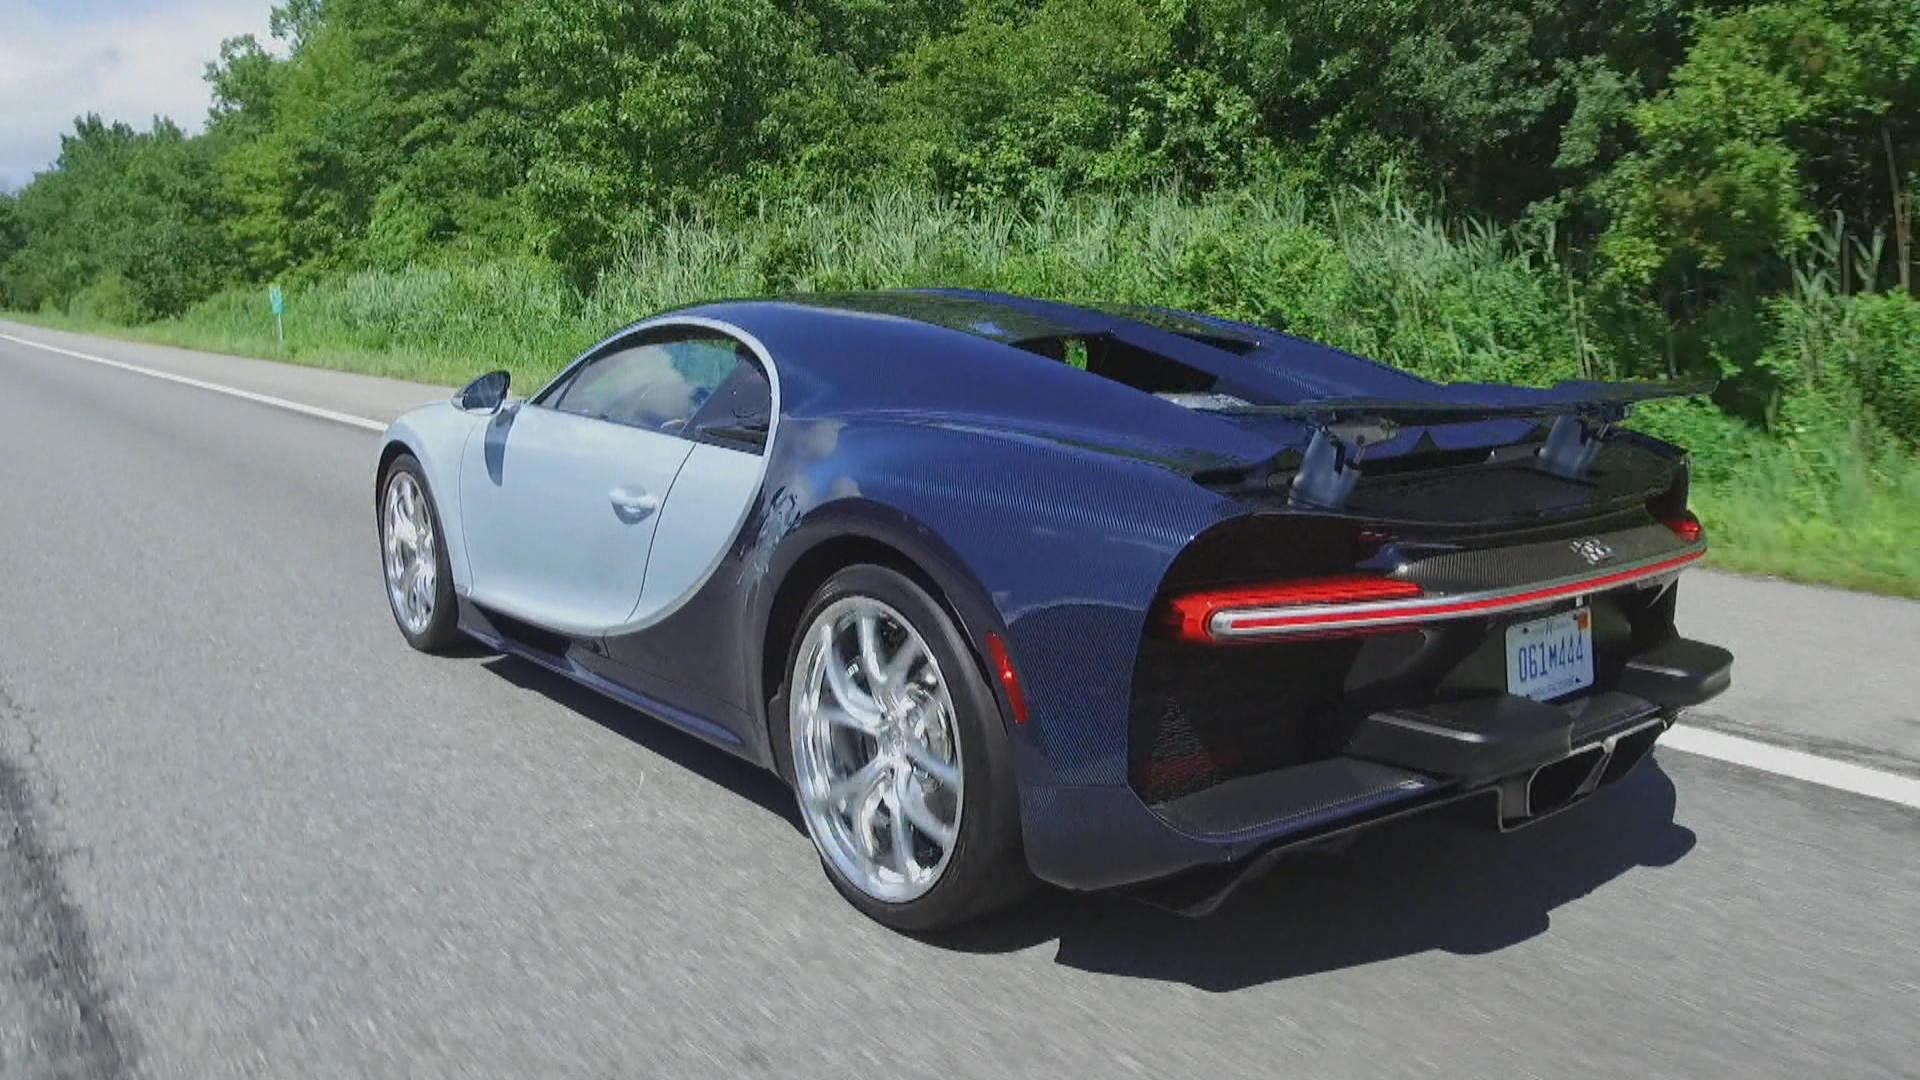 bugatti-1 Inspiring Bugatti Veyron Price Australian Dollars Cars Trend